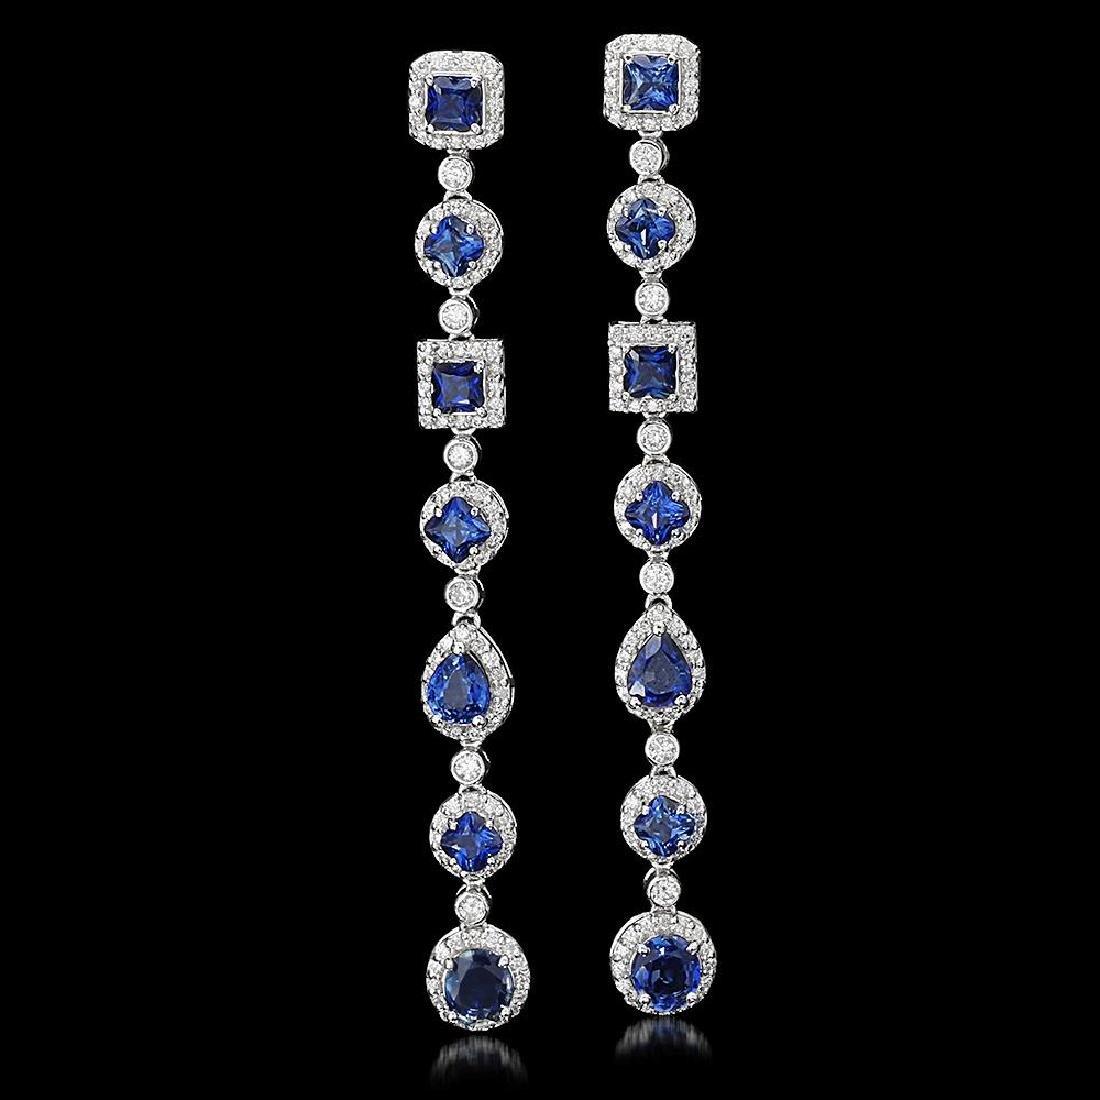 18K Gold 6.39ct Sapphire 2.87ct Diamond Earrings